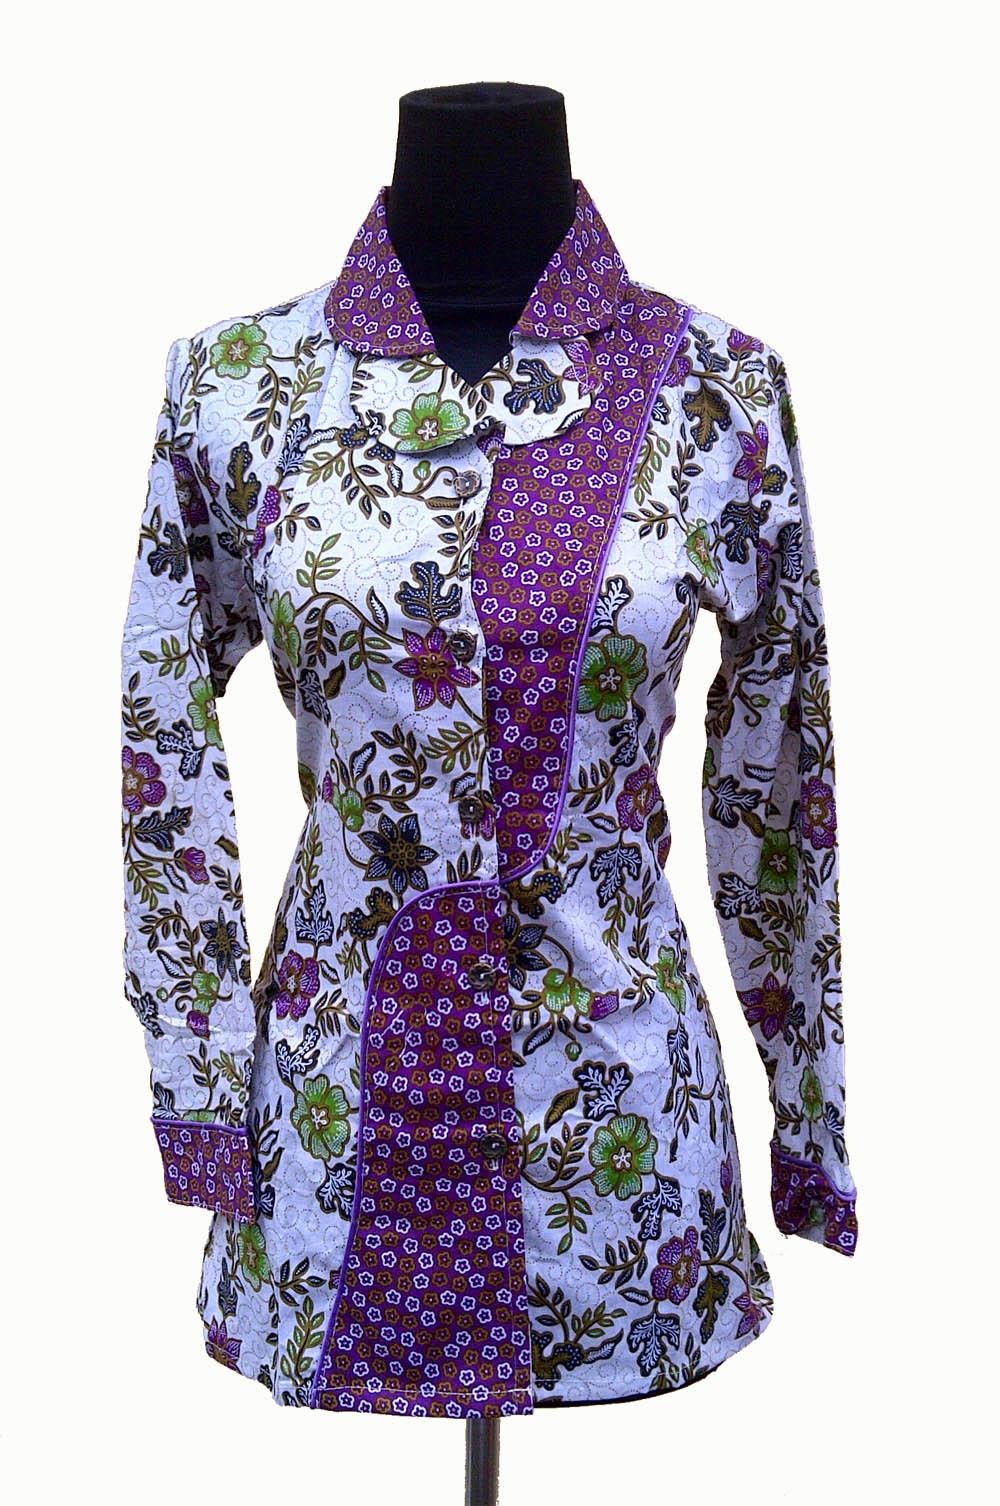 Baju Batik Modern Pekalongan – Kain Batik Bunga Mawar